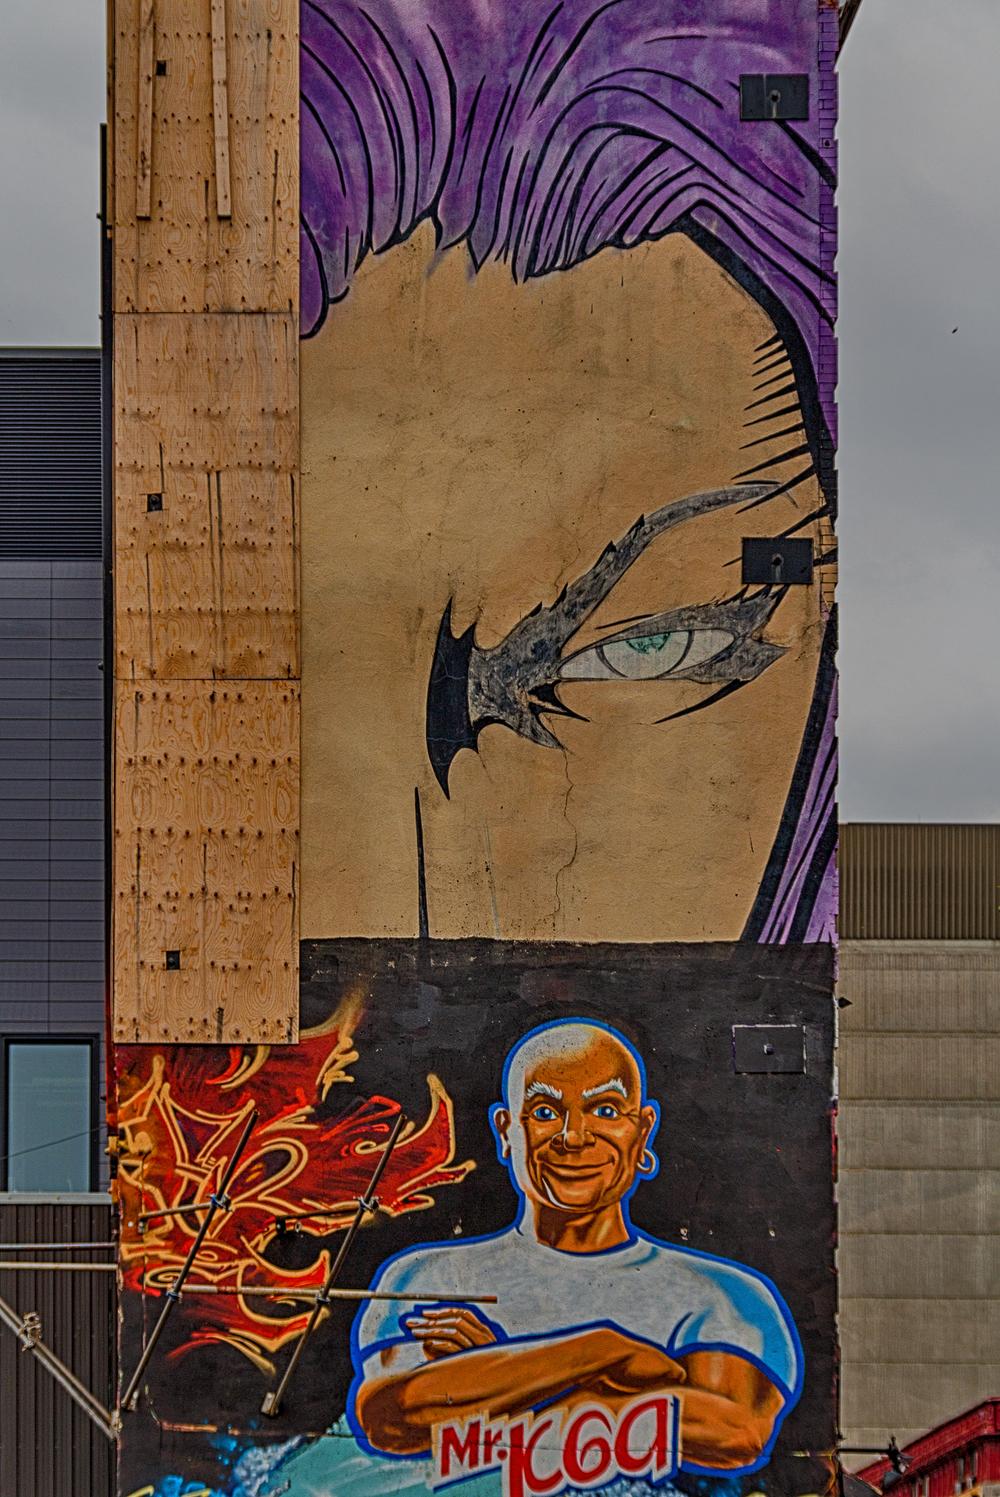 20140816_Grafitti and Architechture - Latin Quarter_IMG_5750_HDR-M.jpg